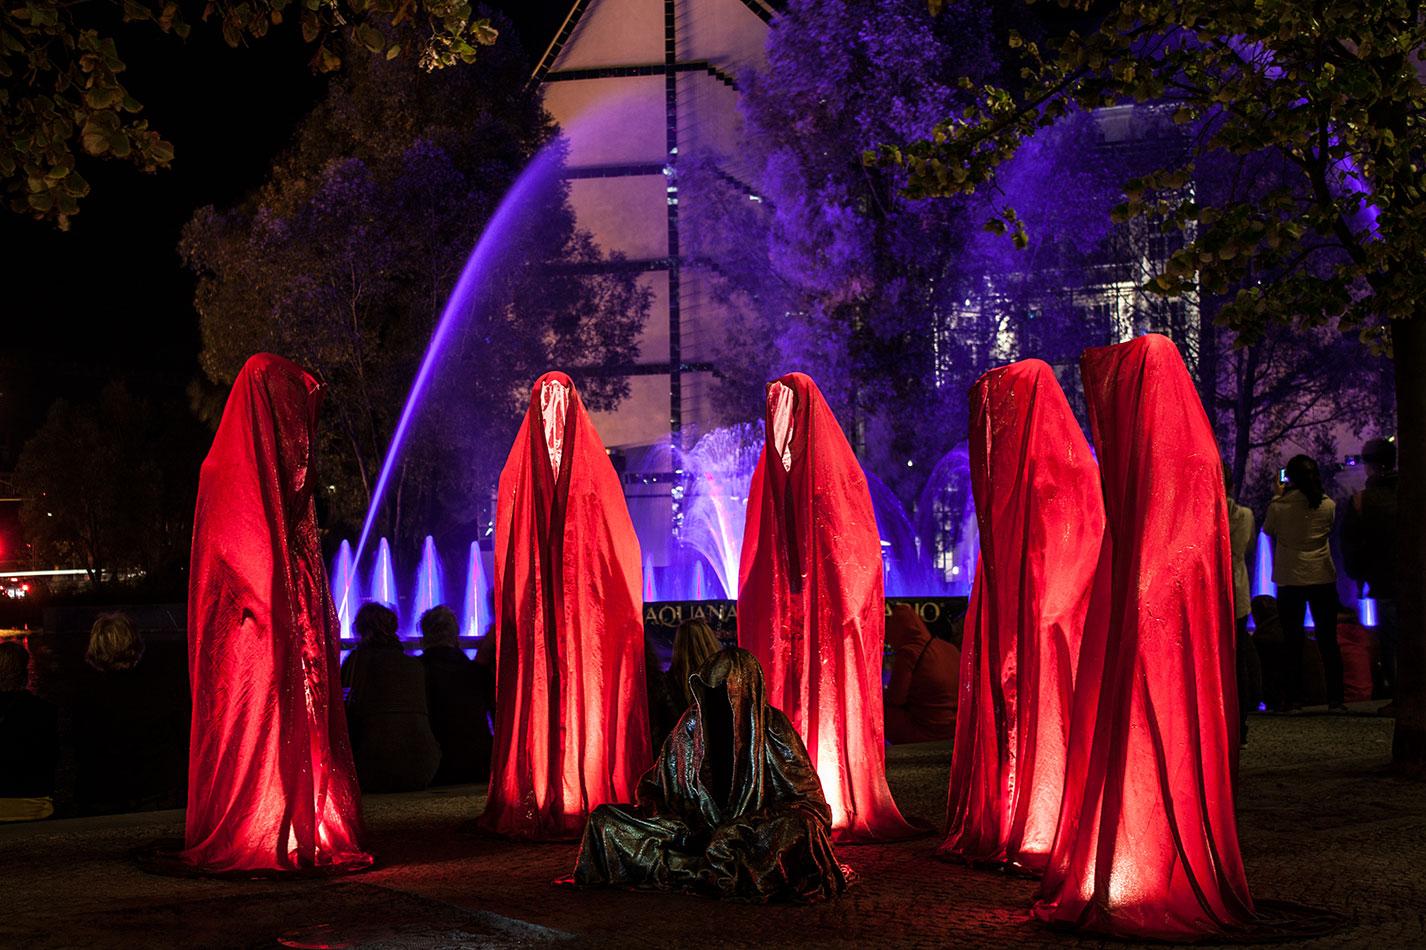 festival-of-lights-berlin-light-art-festival-contemporary-fine-art-design-show-guardiansof-time-manfred-kili-kielnhofer-sculpture-3793